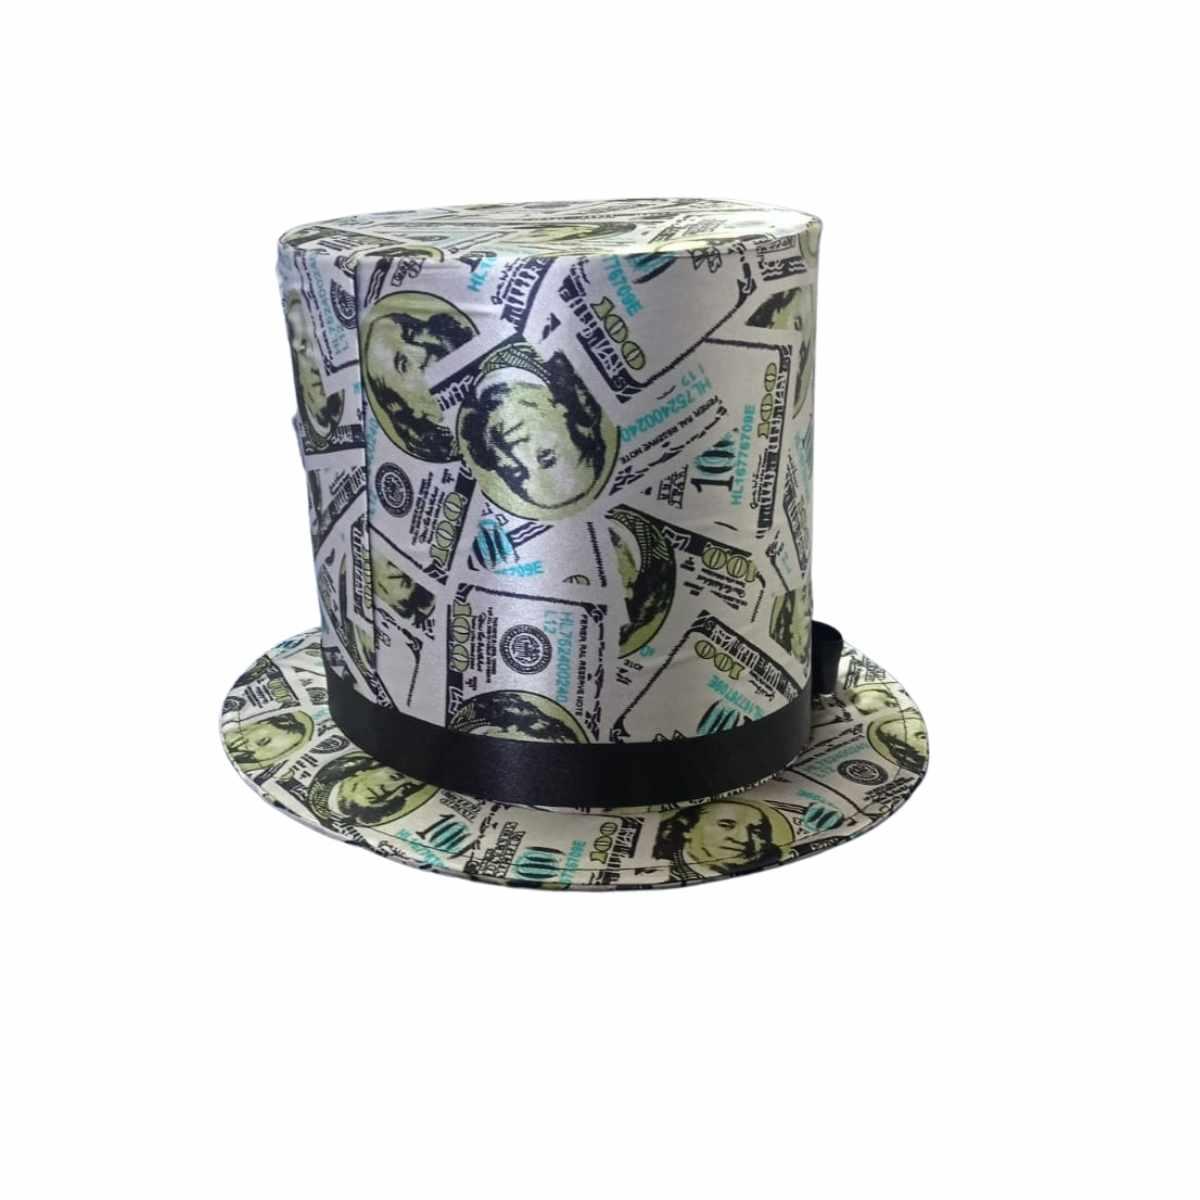 Cartola Dólar Cetim Adulto